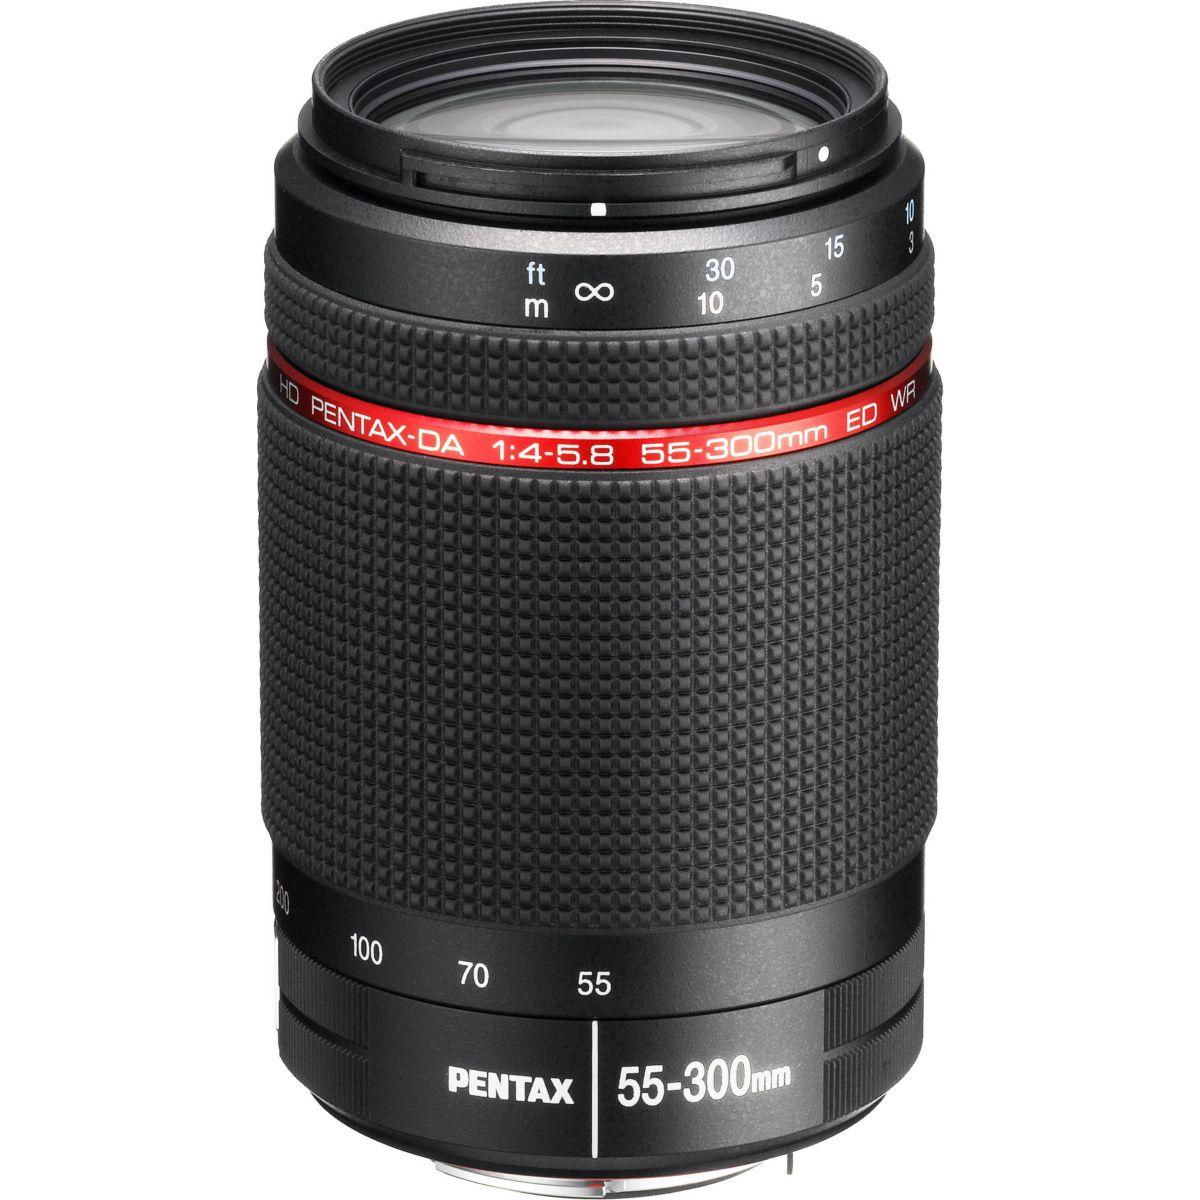 Objectif PENTAX DA 55-300mm f/4-5.8 ED WR